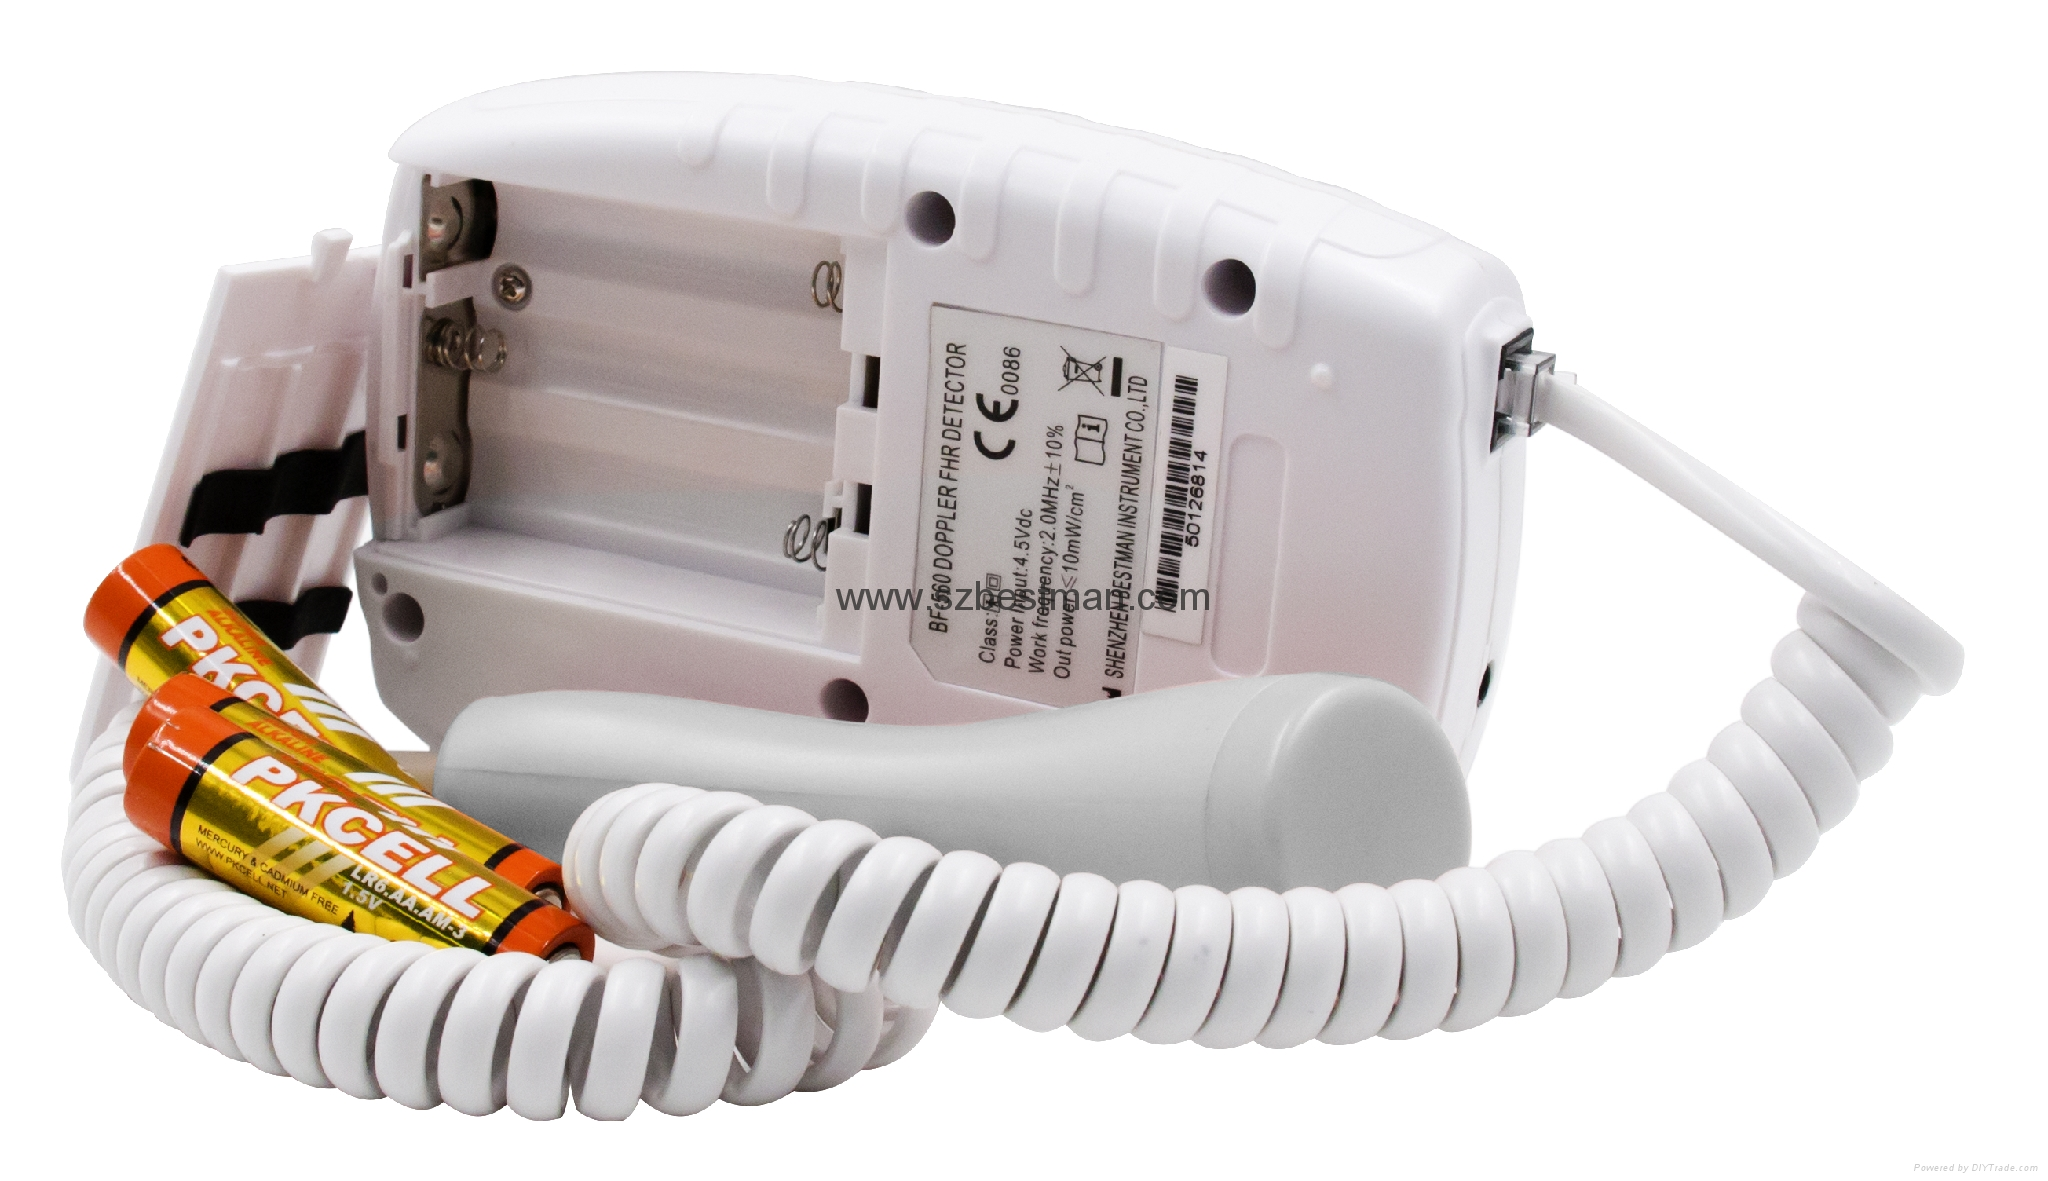 Bestman CE/FDA Pocket Fetal Doppler BF-560 Home Use     5